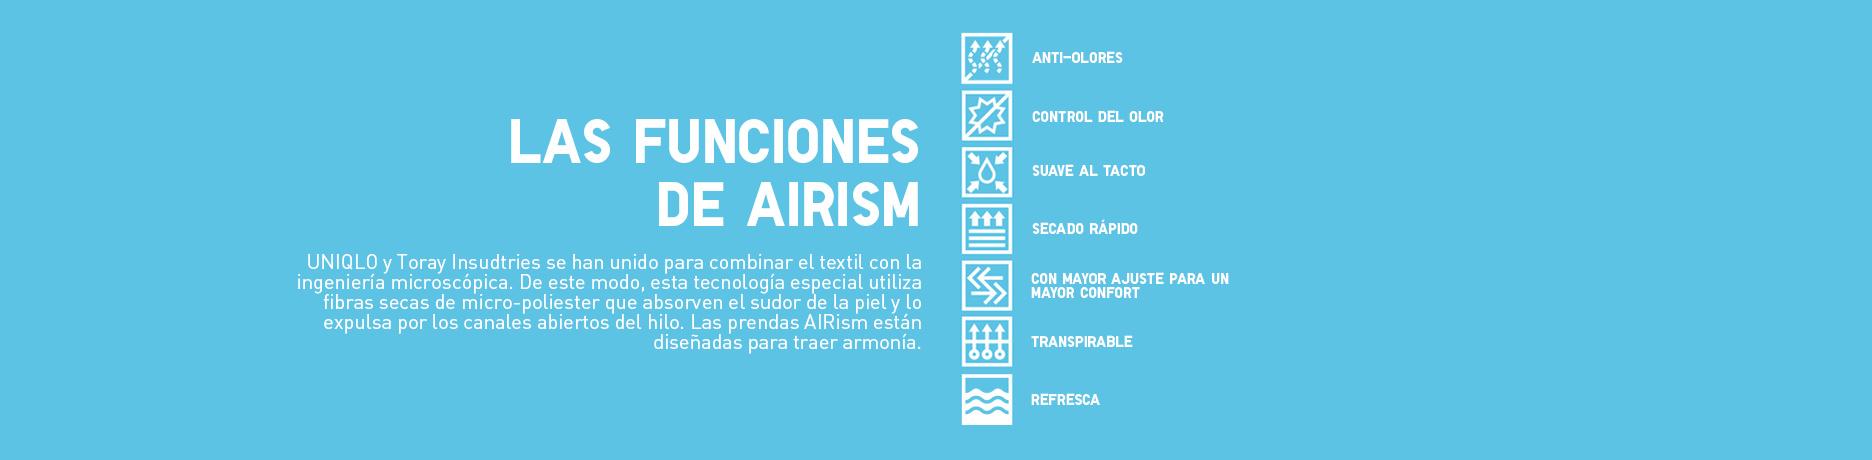 Funciones de AIRism